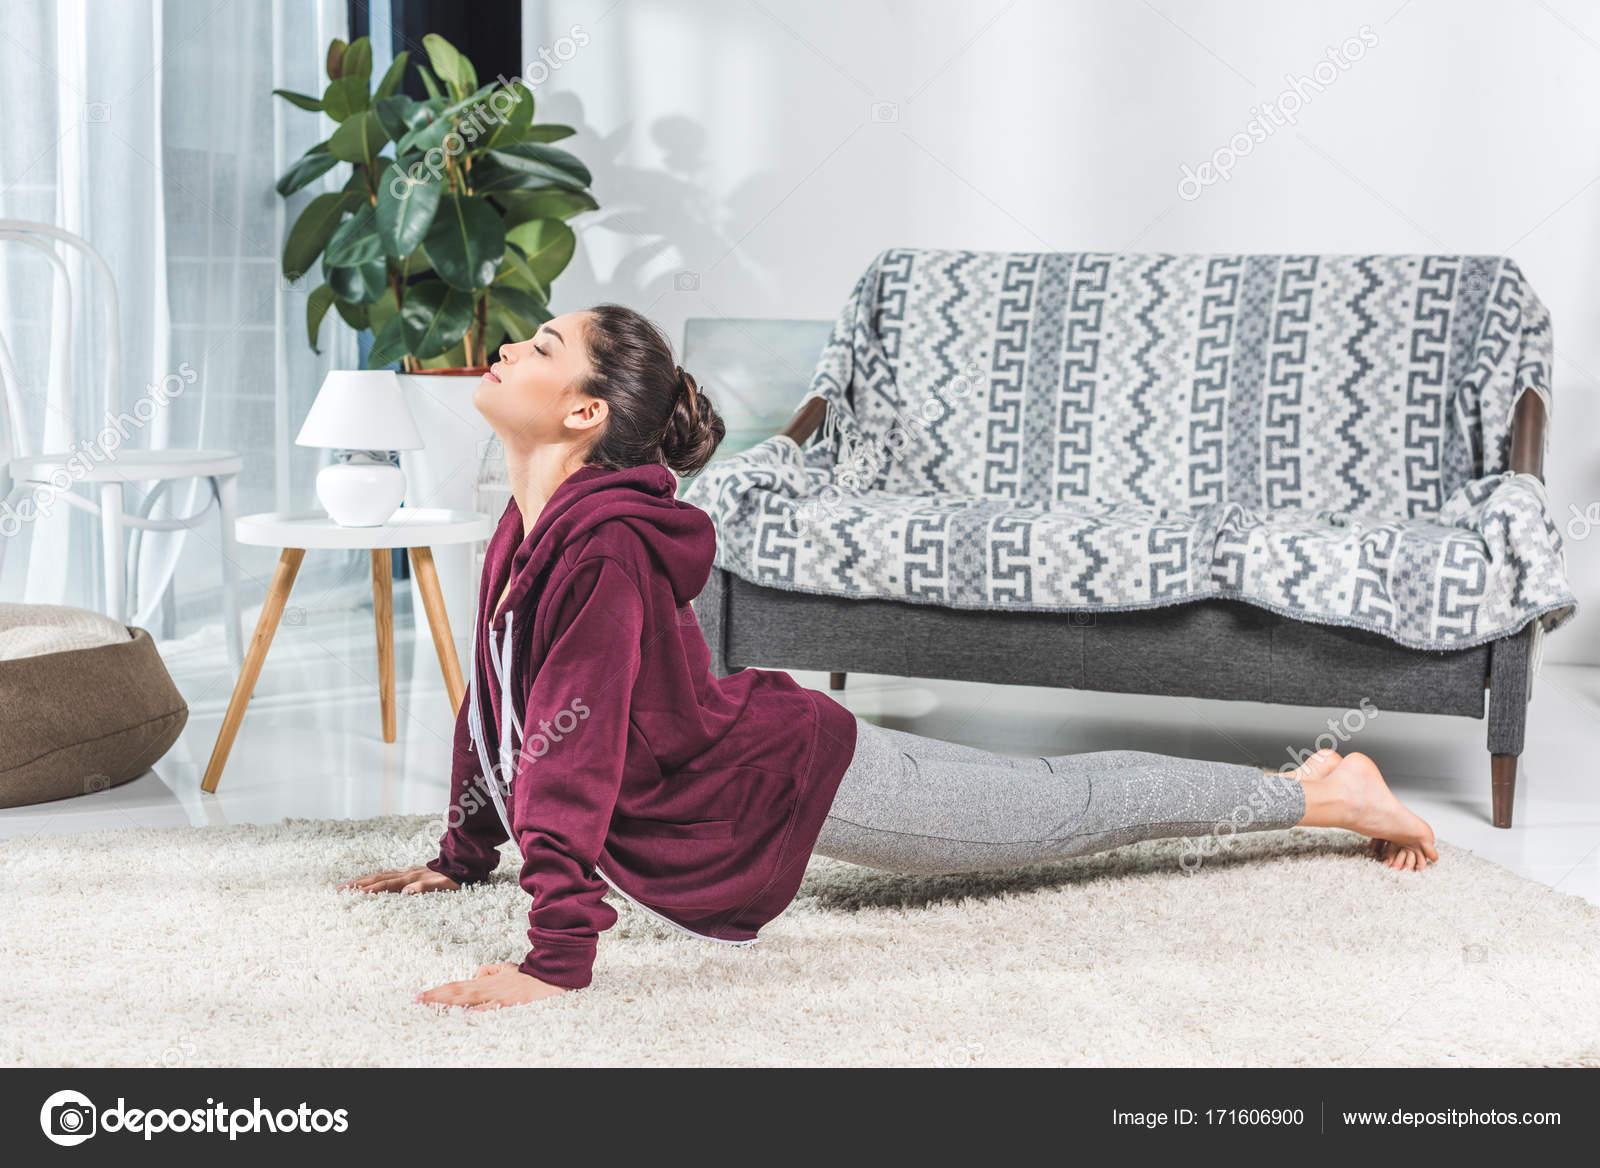 скачать фото девушек брюнеток в домашних условиях